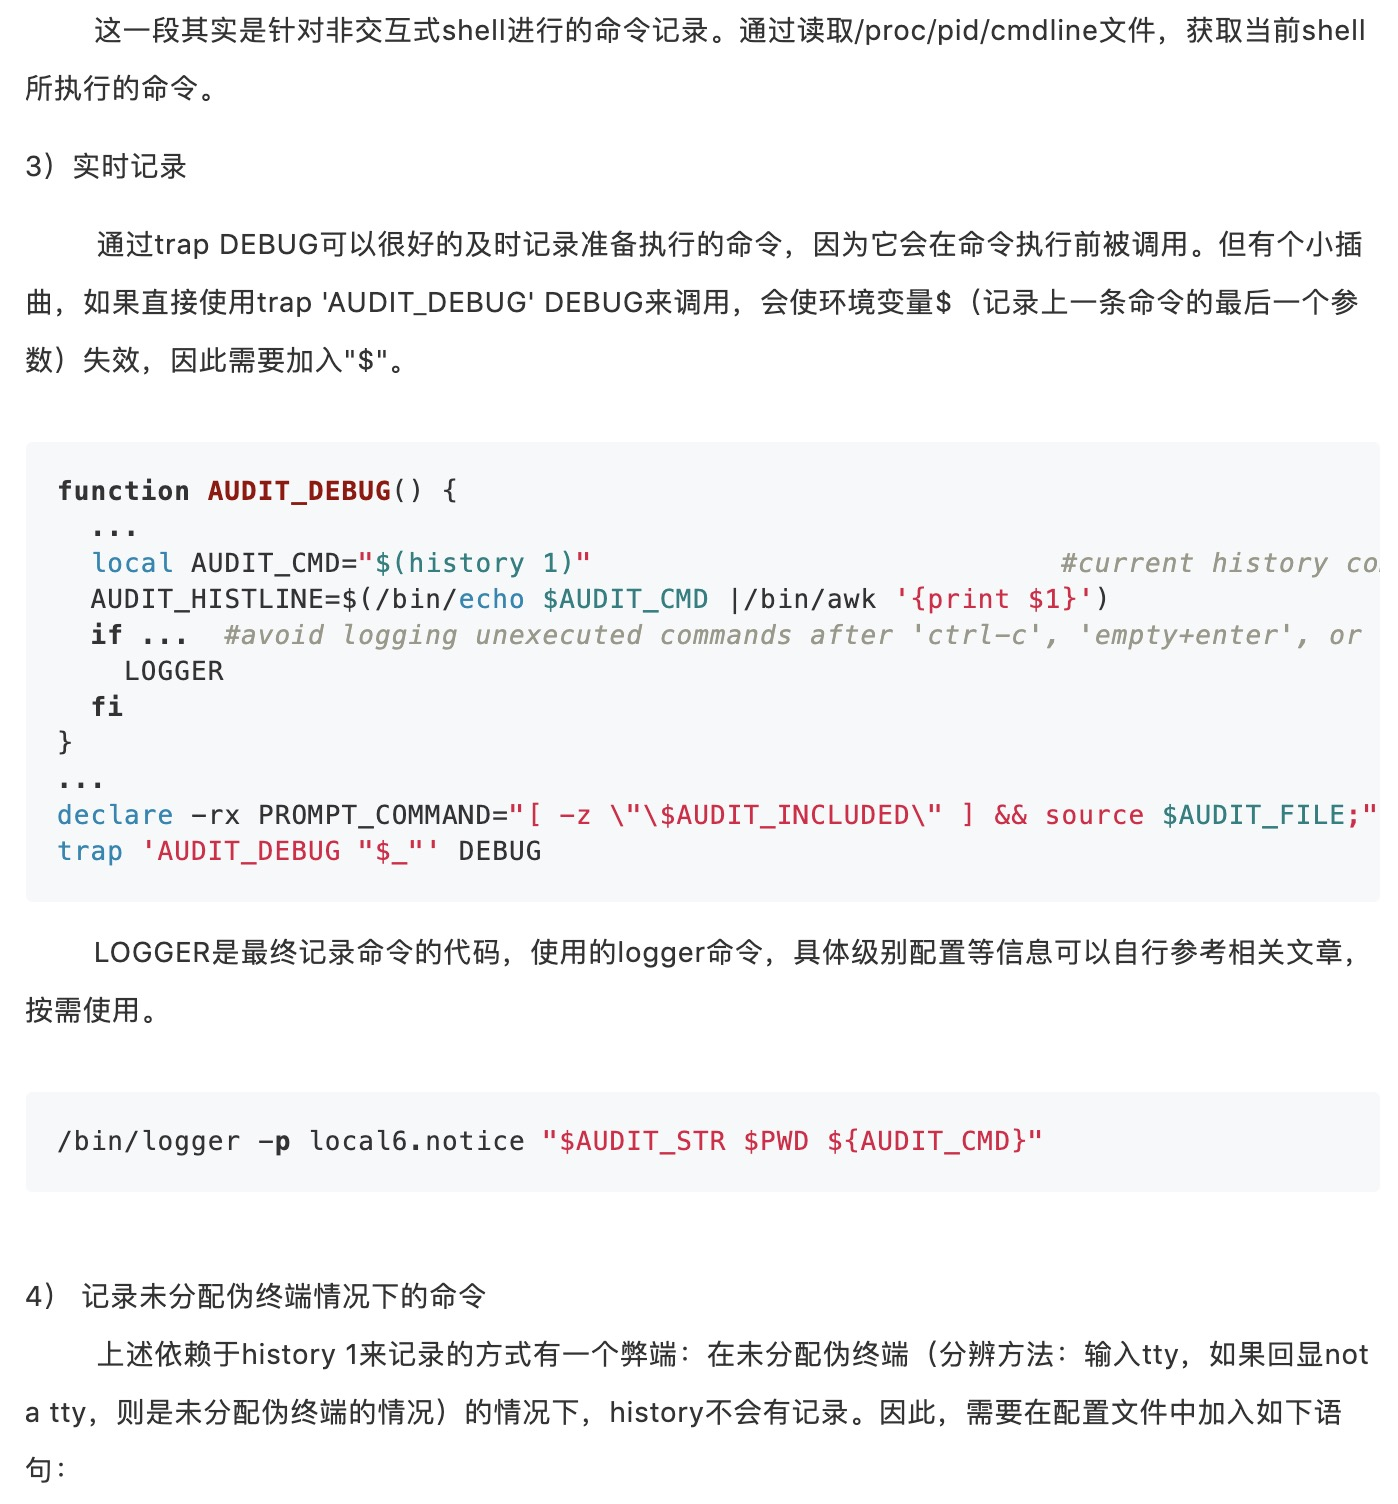 https://momo-mmsrc.oss-cn-hangzhou.aliyuncs.com/img-7dab66e1-1182-3ded-bcf0-537bbf58817b.jpeg